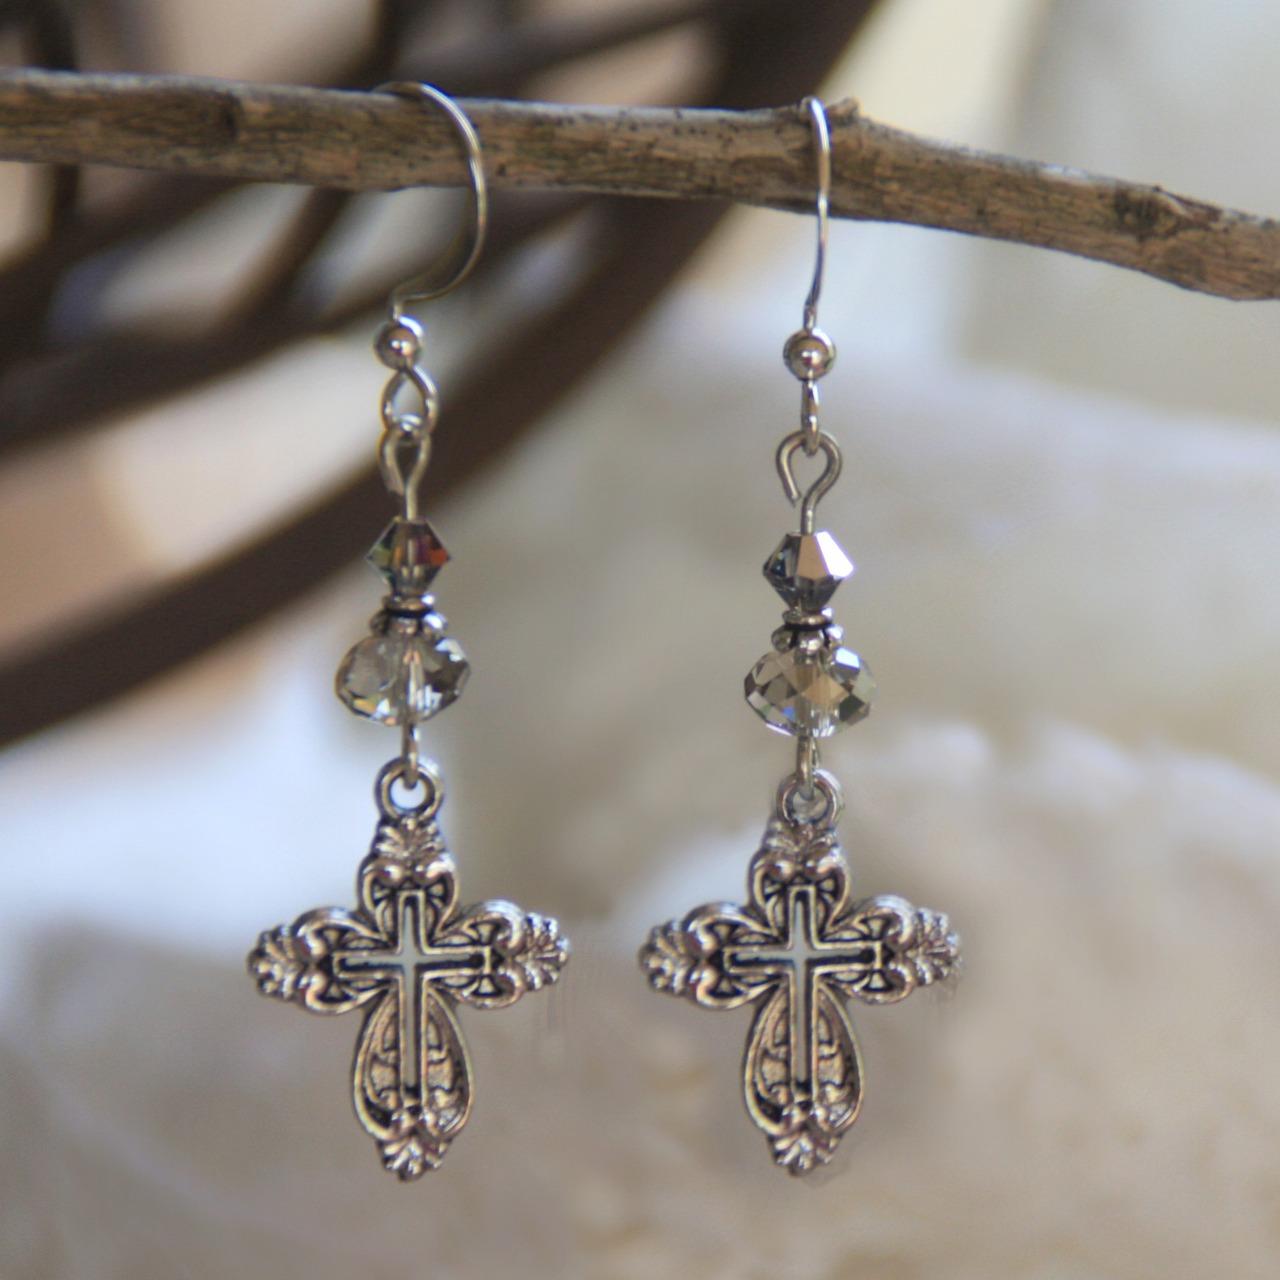 Swarovski Crystal Cross Earrings earrings, jewelry, drop earrings, crystal cross earrings, mothers day gift, cross earrings, cross, crystal earrings, in-708